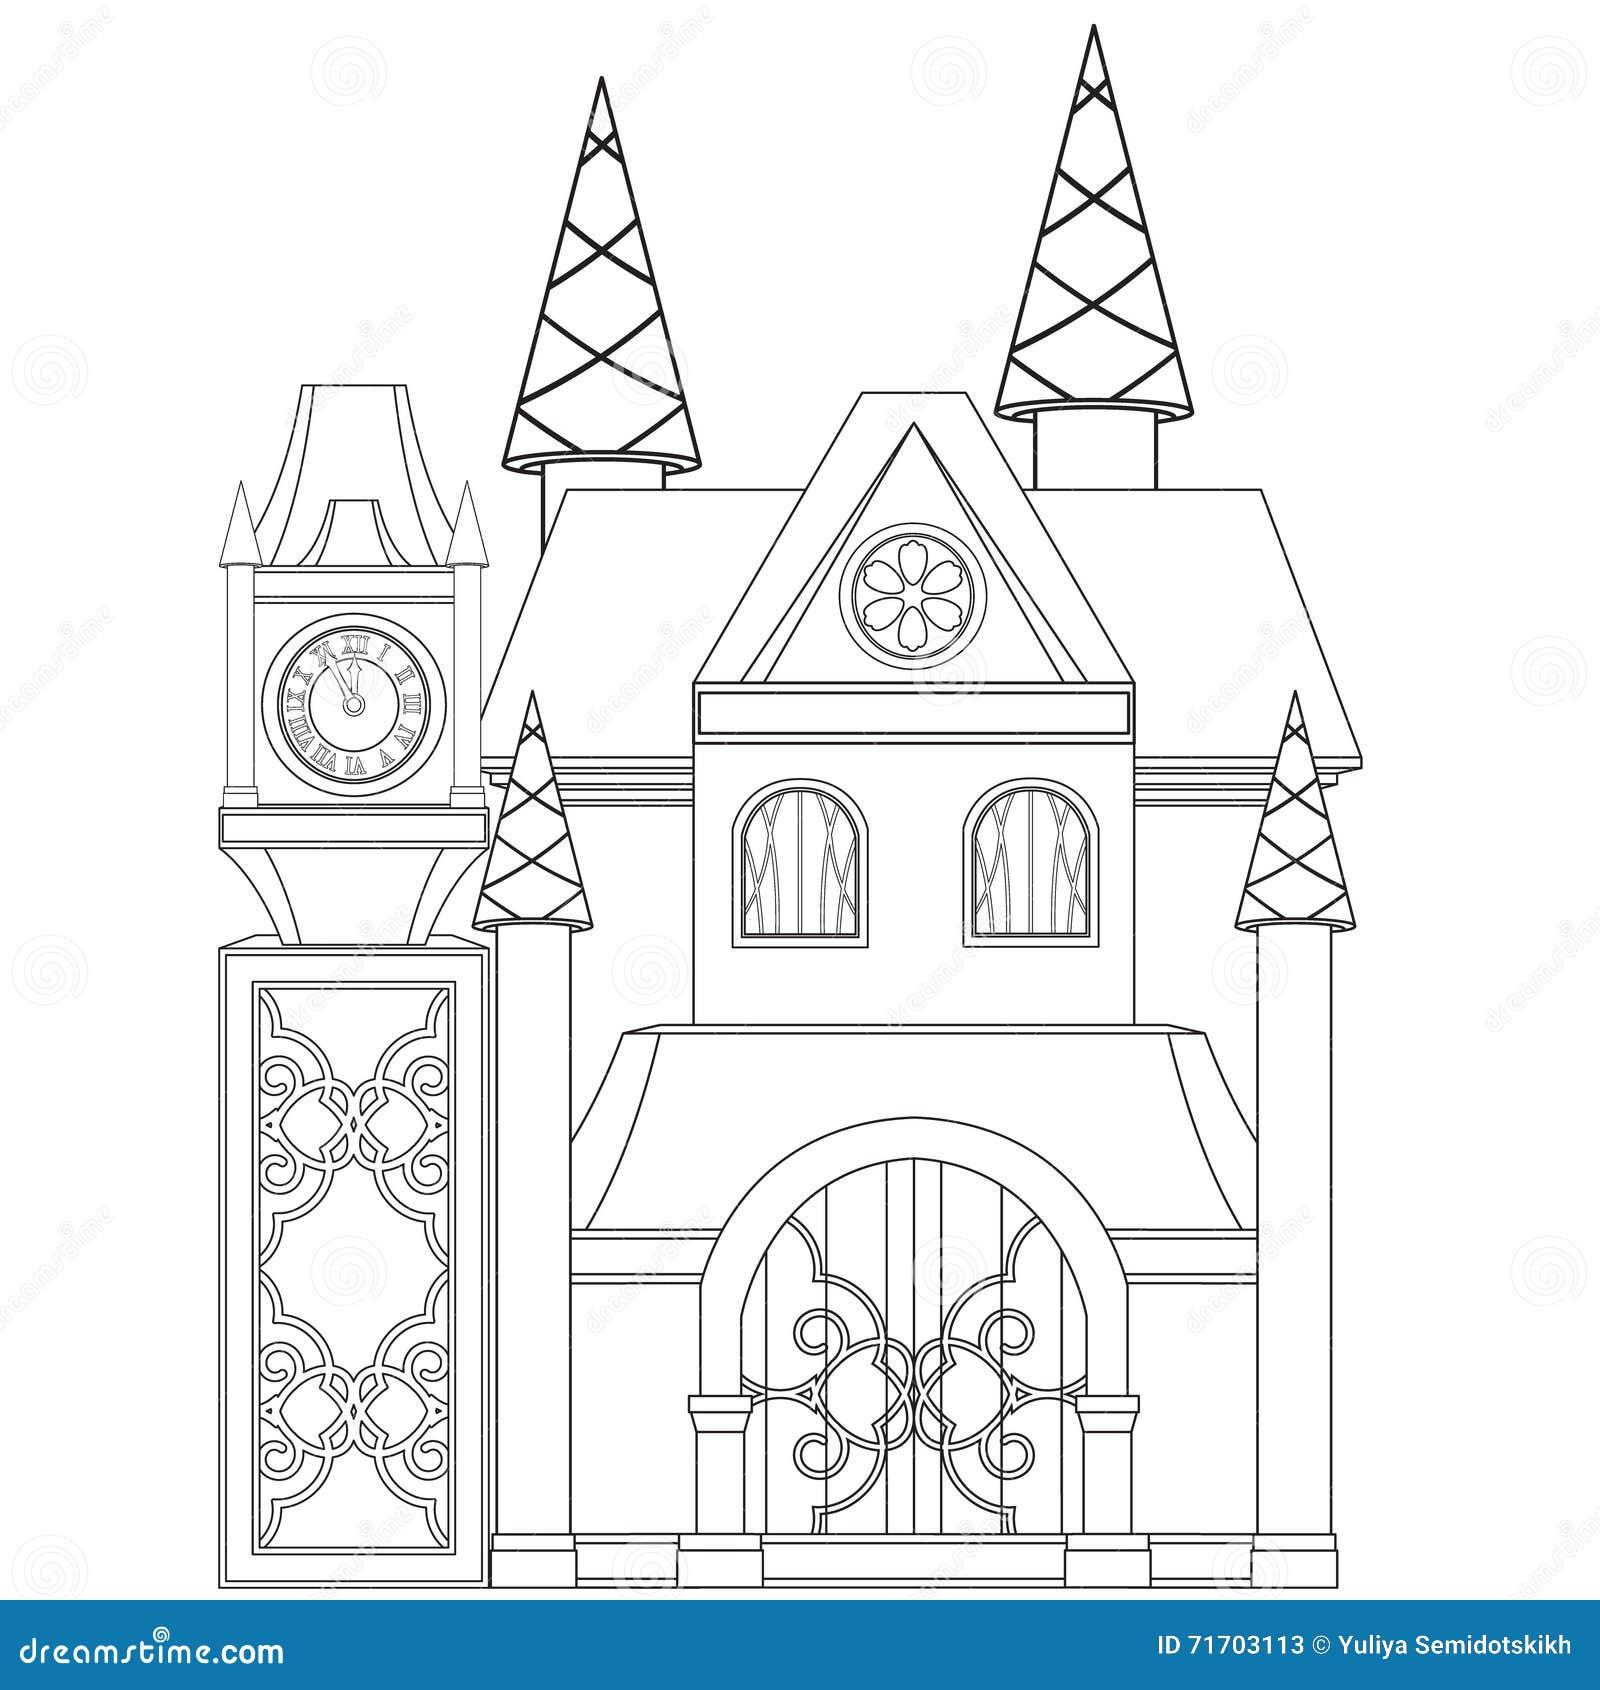 Cinderella Castle Coloring Book Page Stock Vector - Illustration of ...